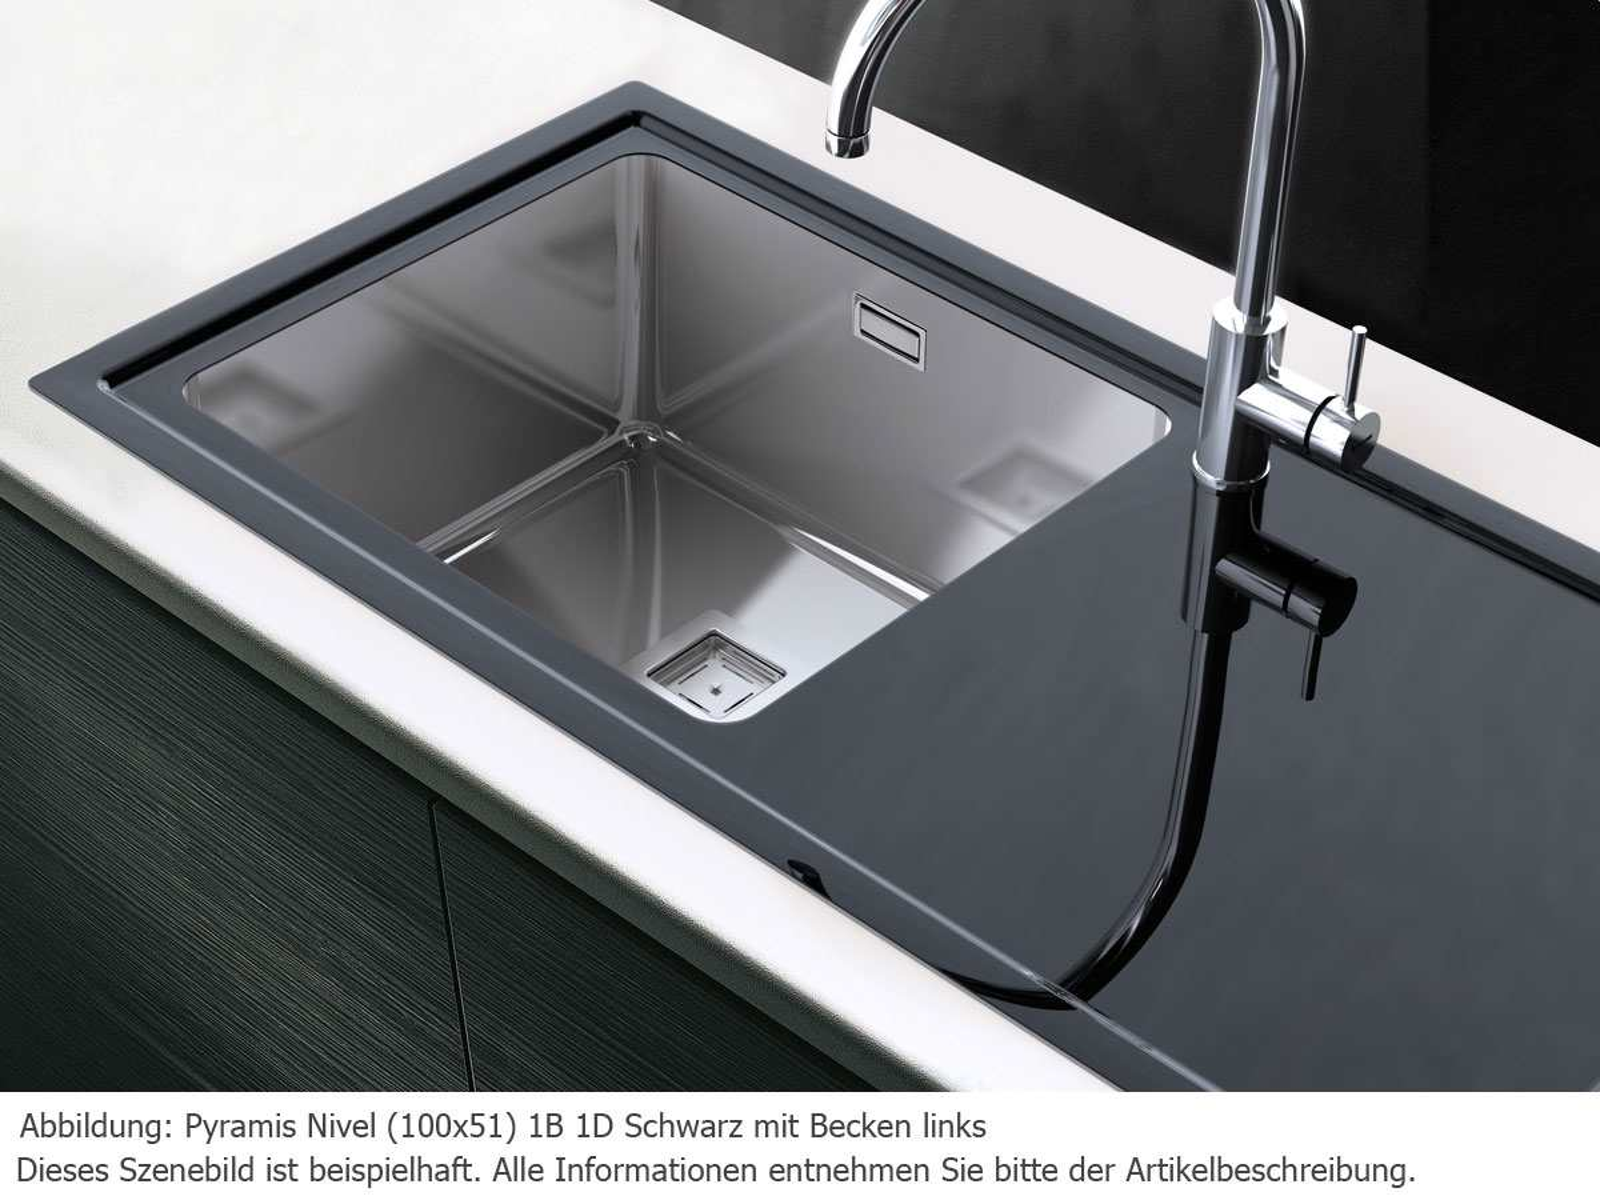 Pyramis Nivel (100x51) 1B 1D Weiß RH Edelstahl-Glas-Spüle